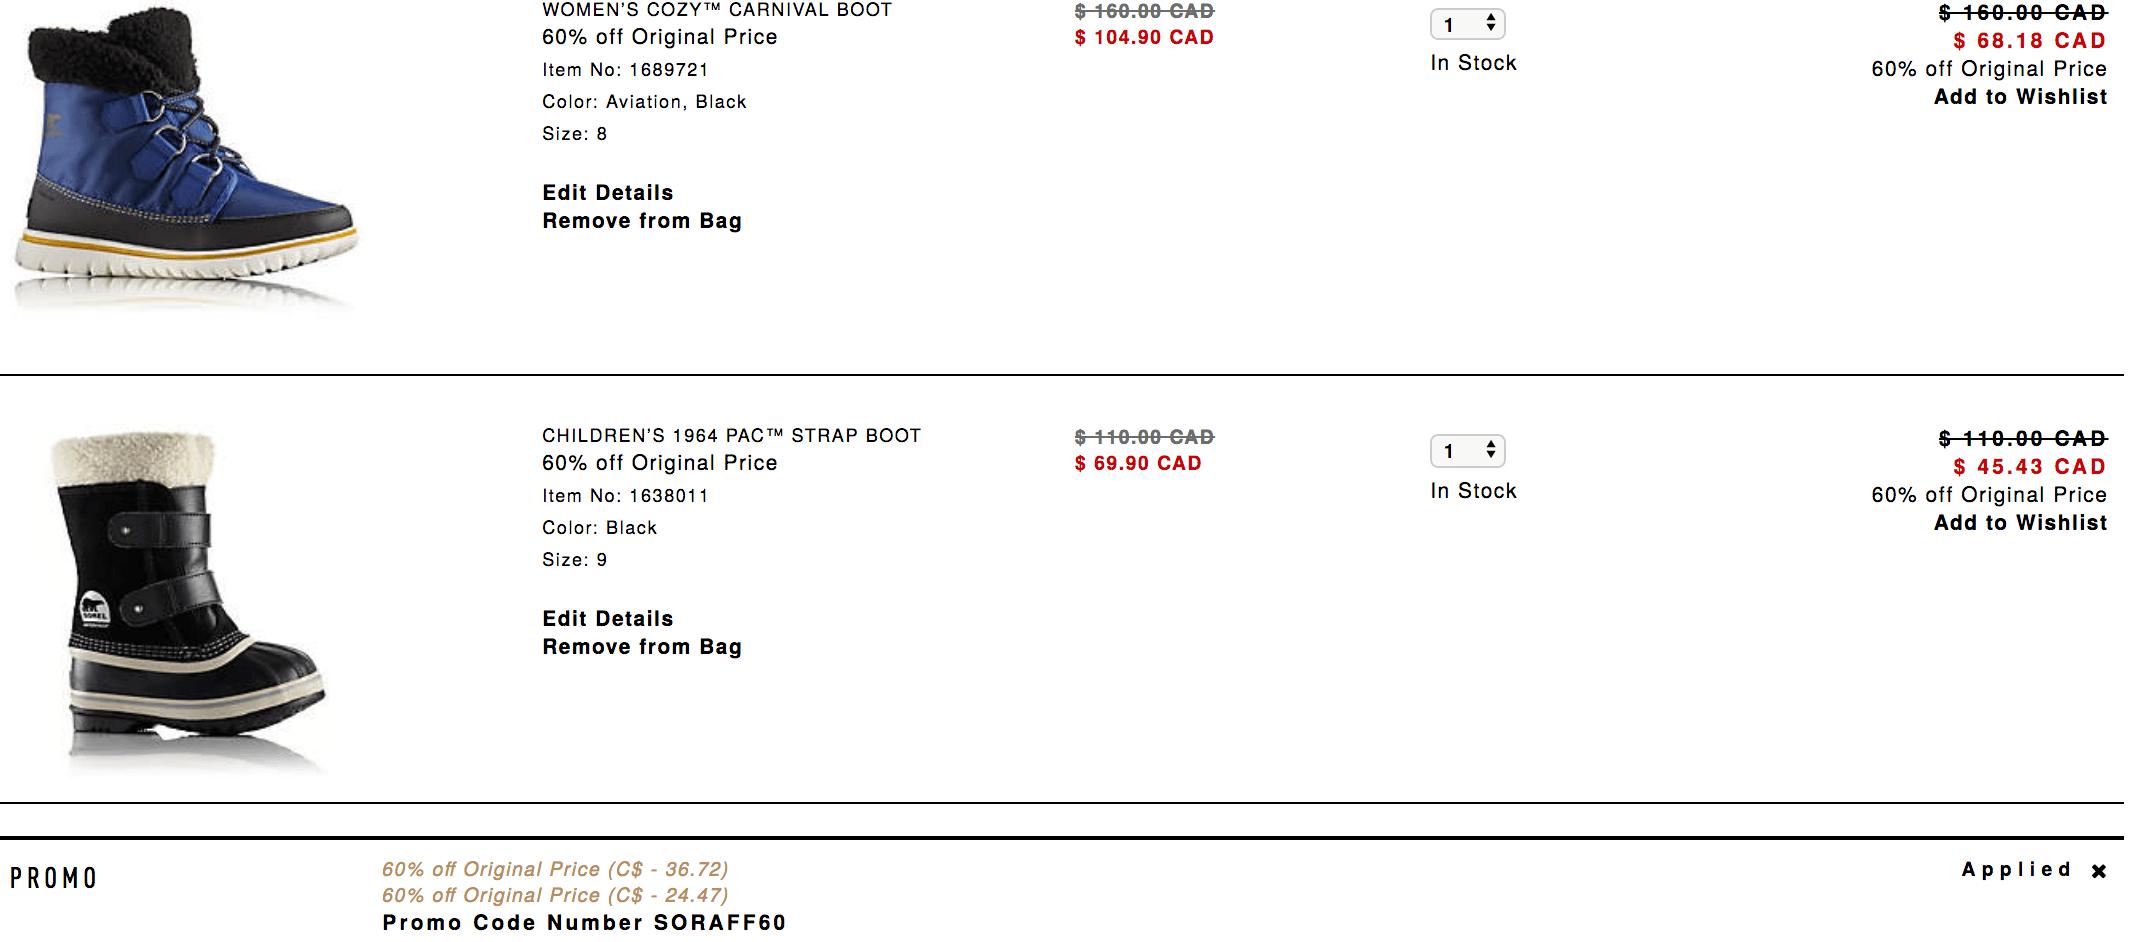 Discount freebies